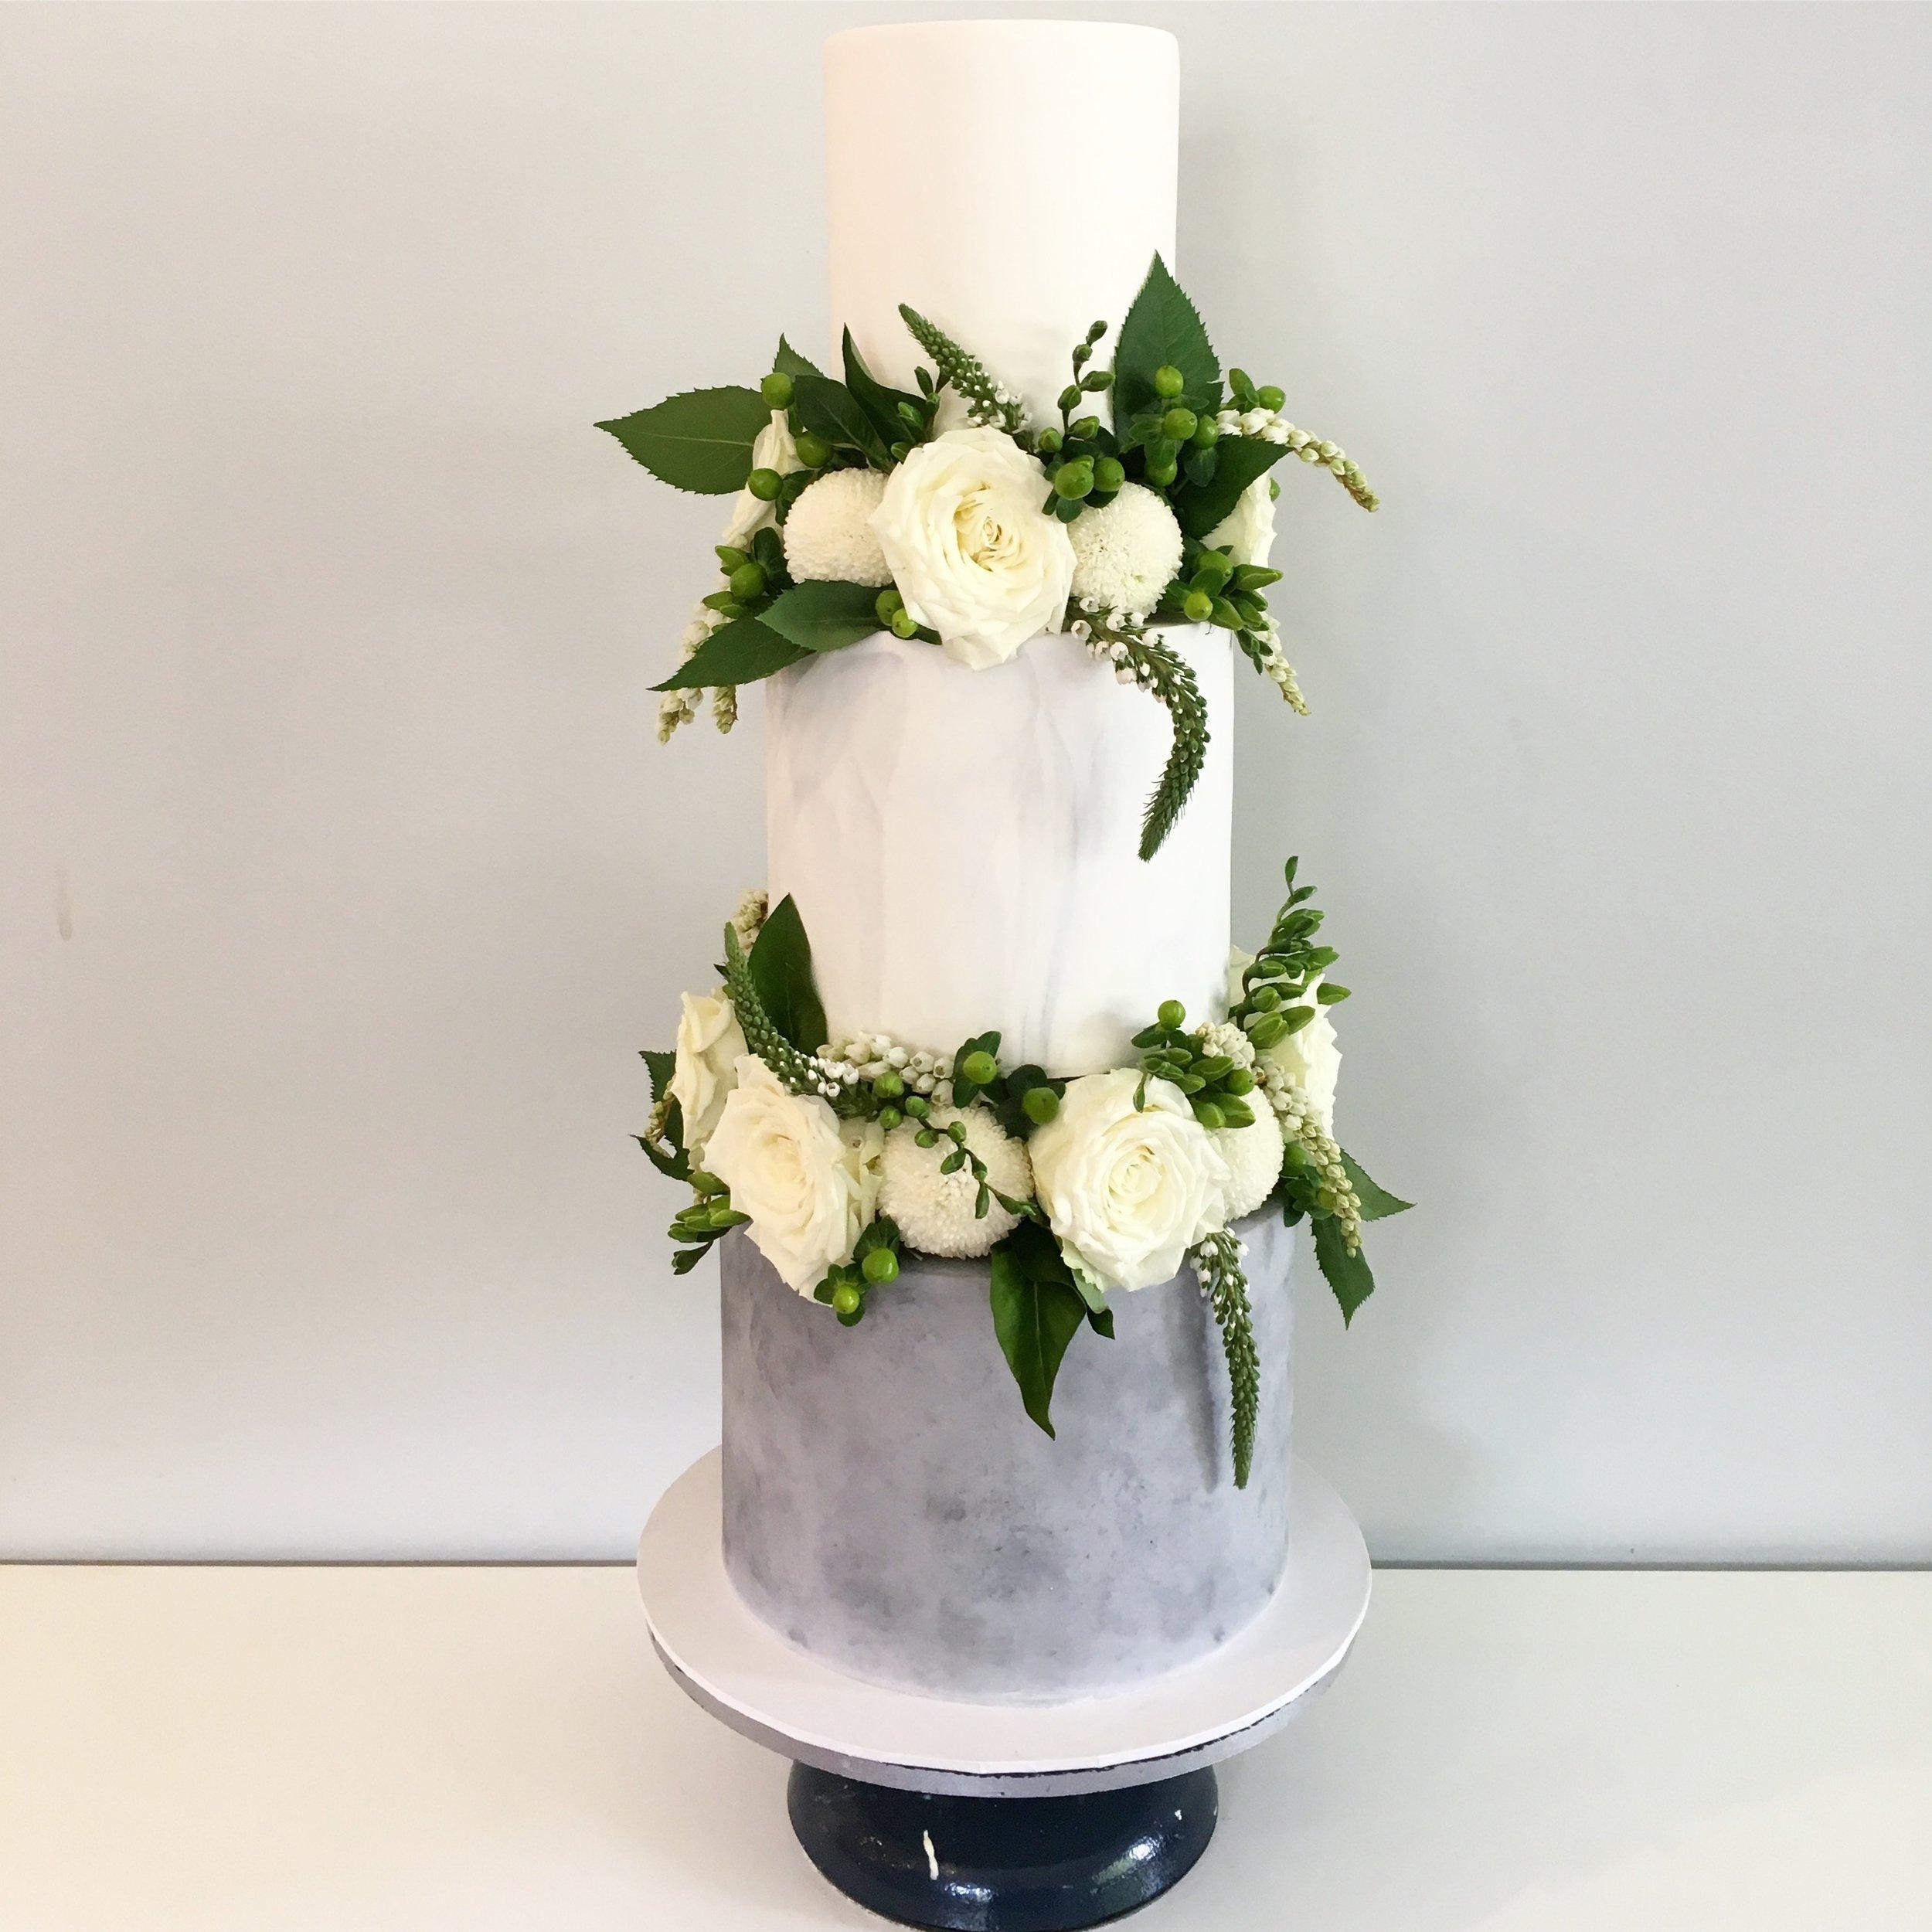 Copy of Marble & Concrete Cake